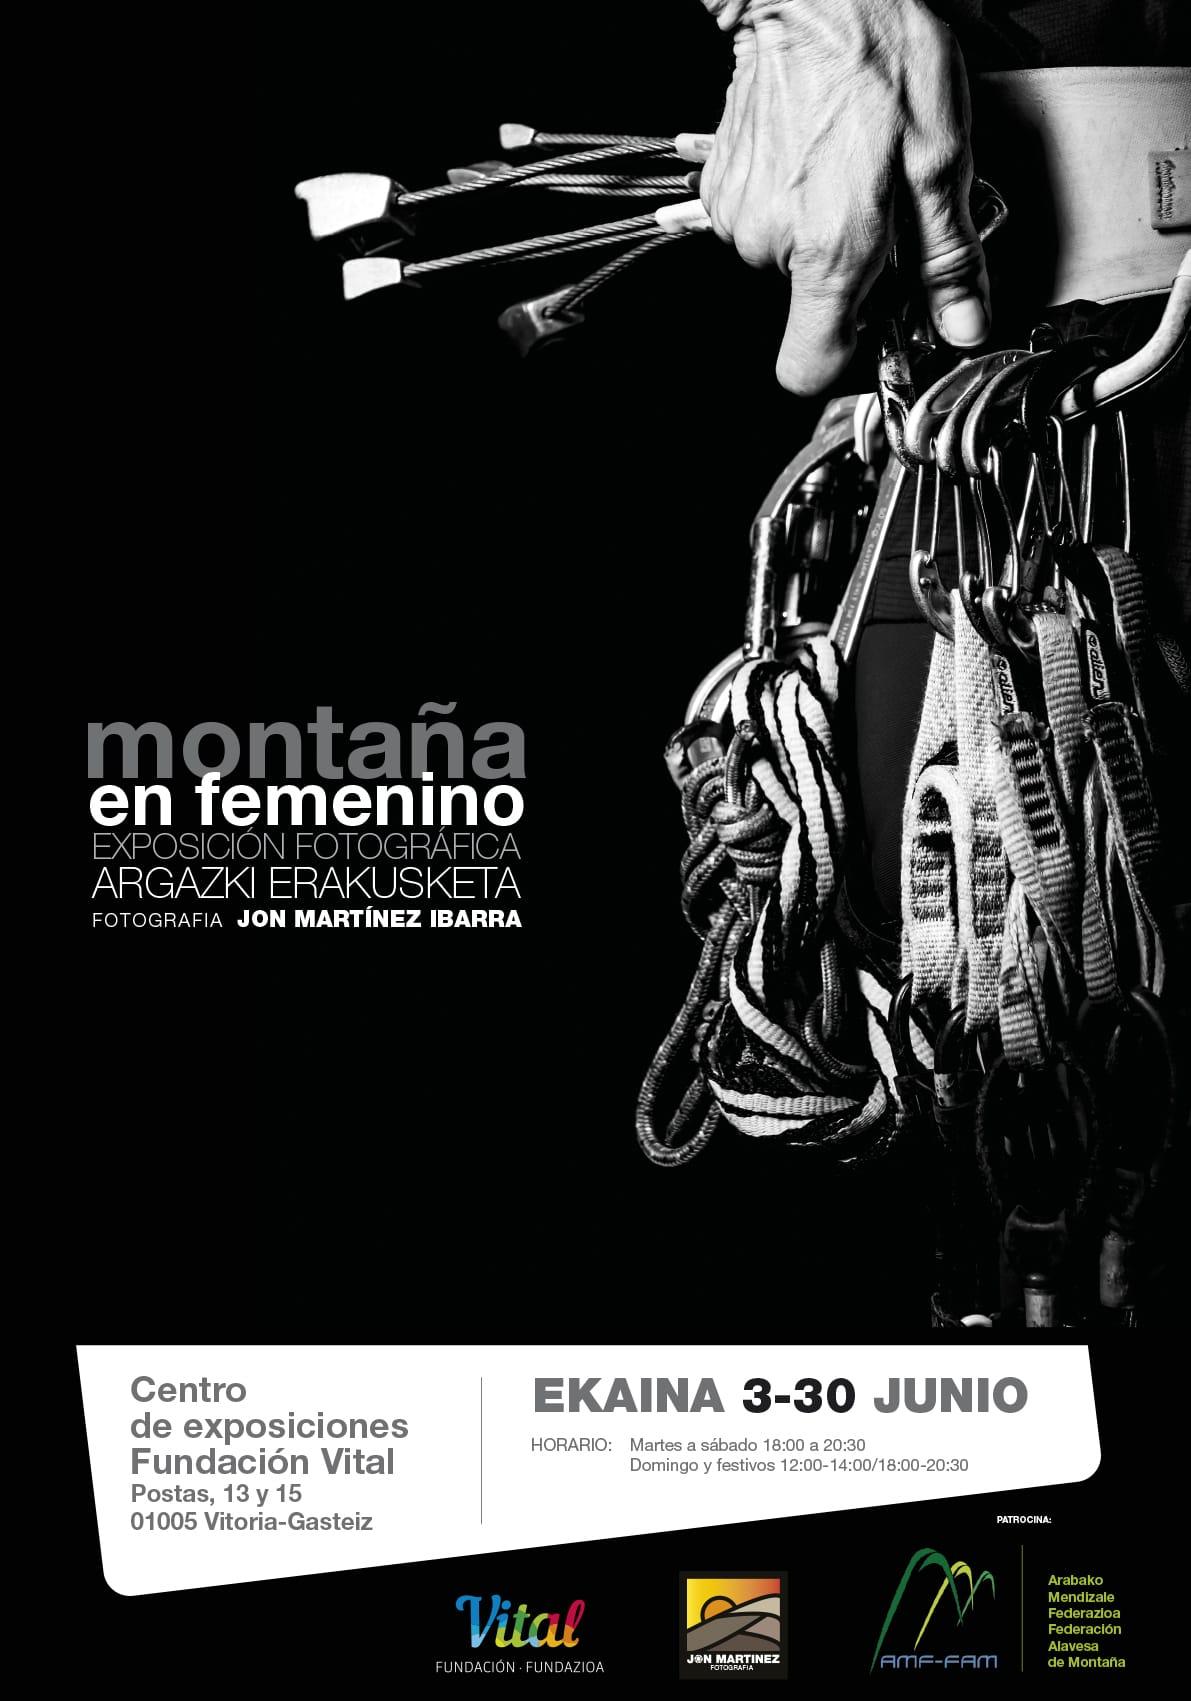 """Montaña en femenino"" con Jon Martínez en Fundación Vital Kutxa."